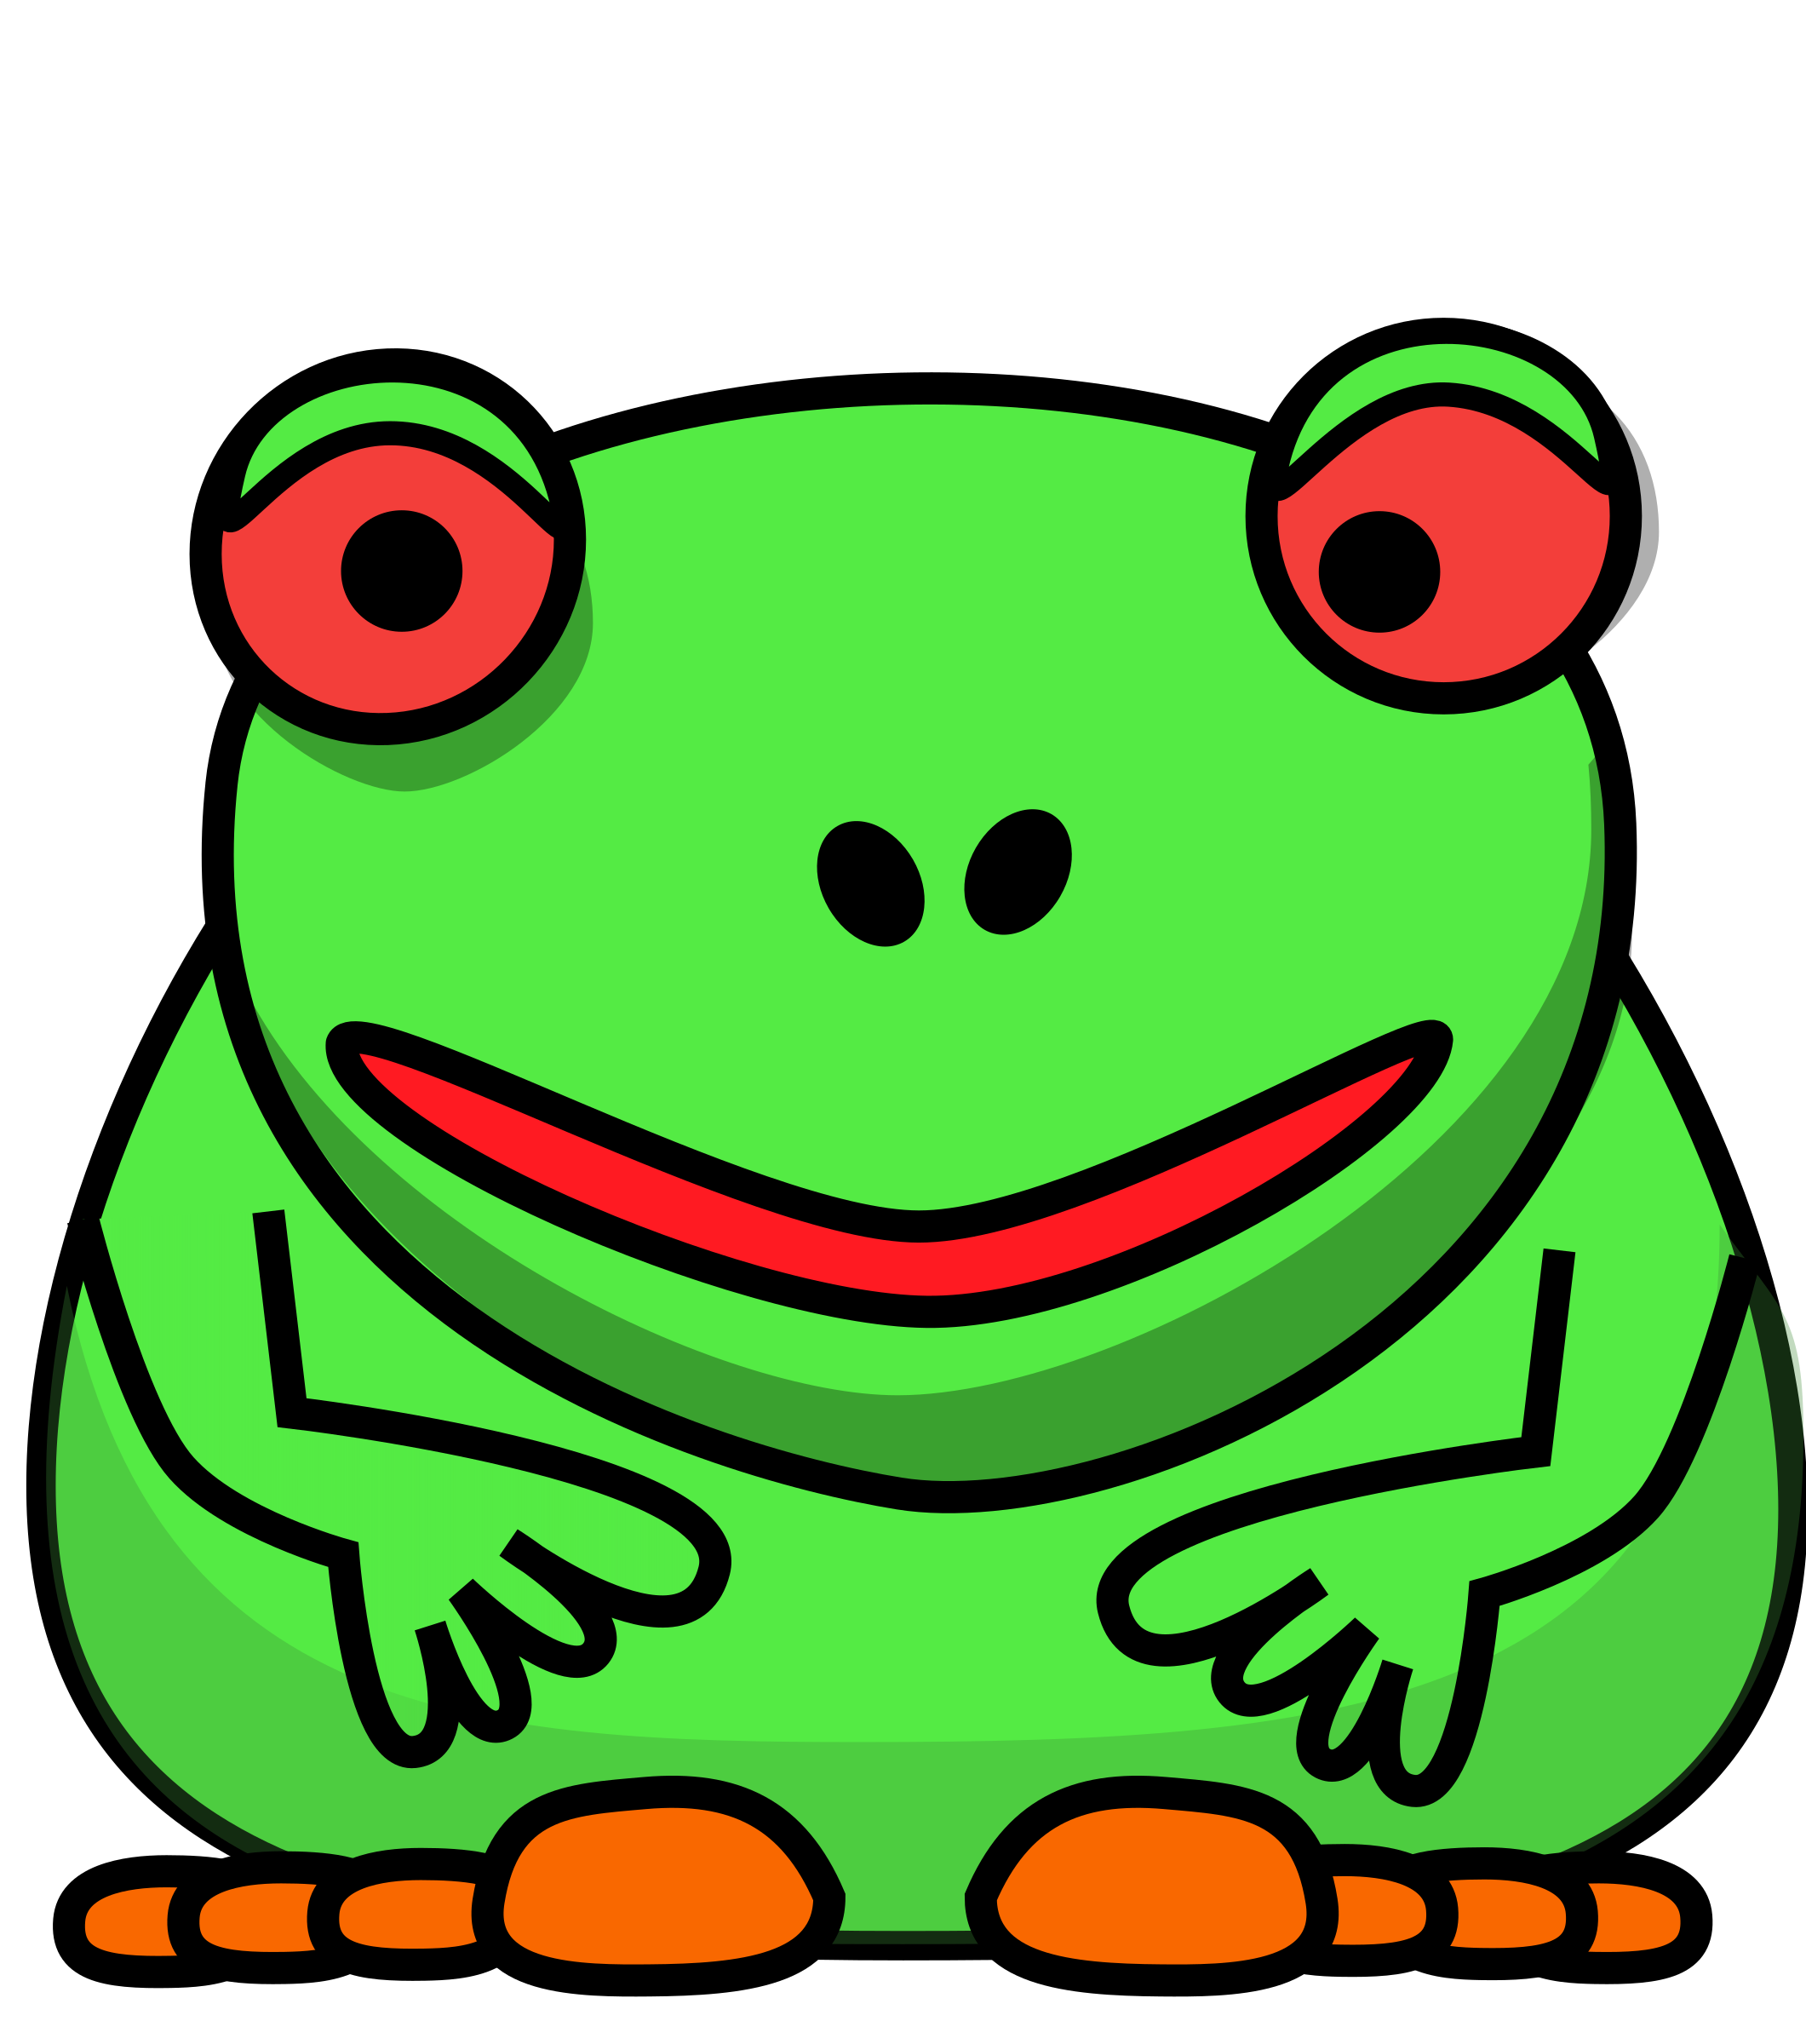 . Frog clipart bullfrog